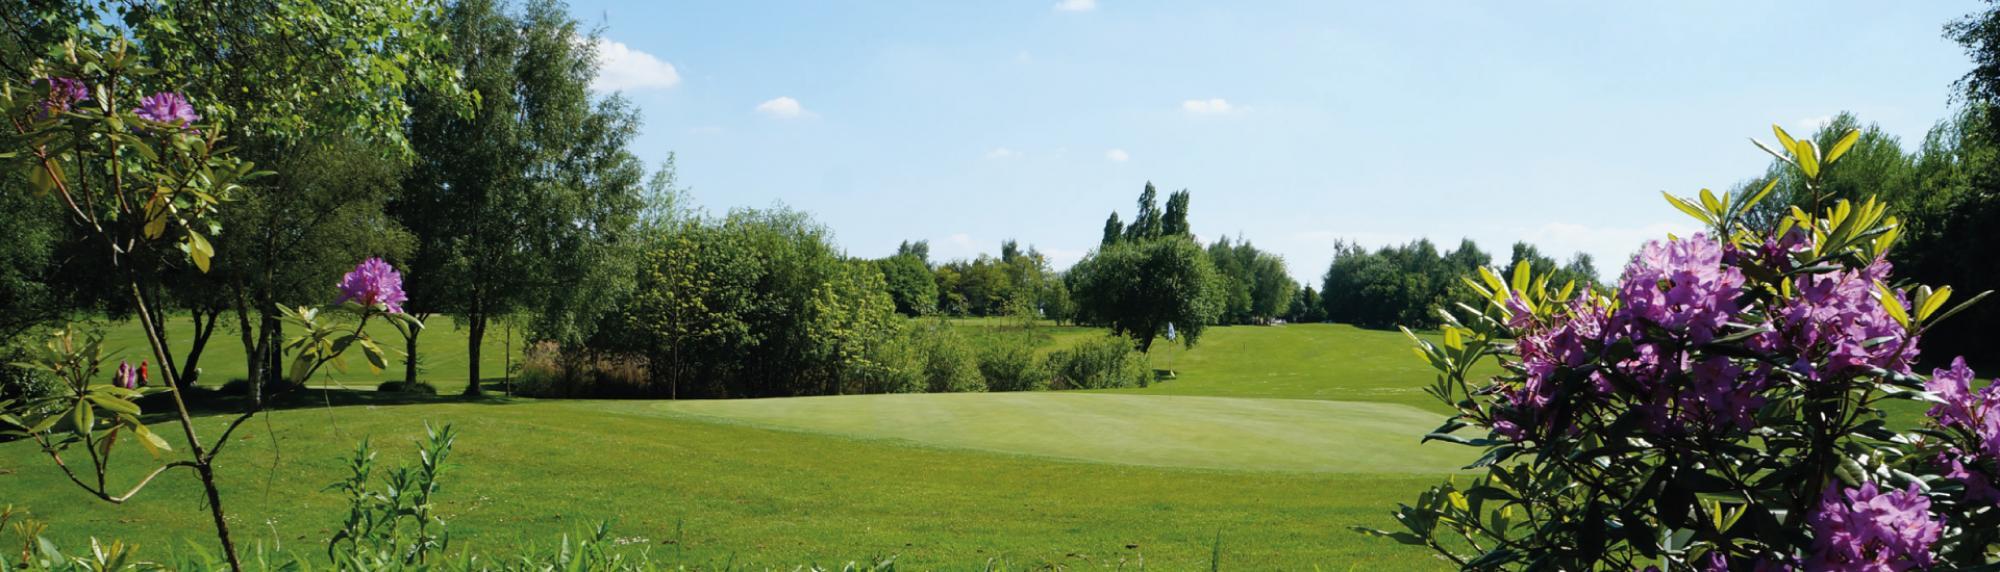 rouen foret verte golf club book a golf